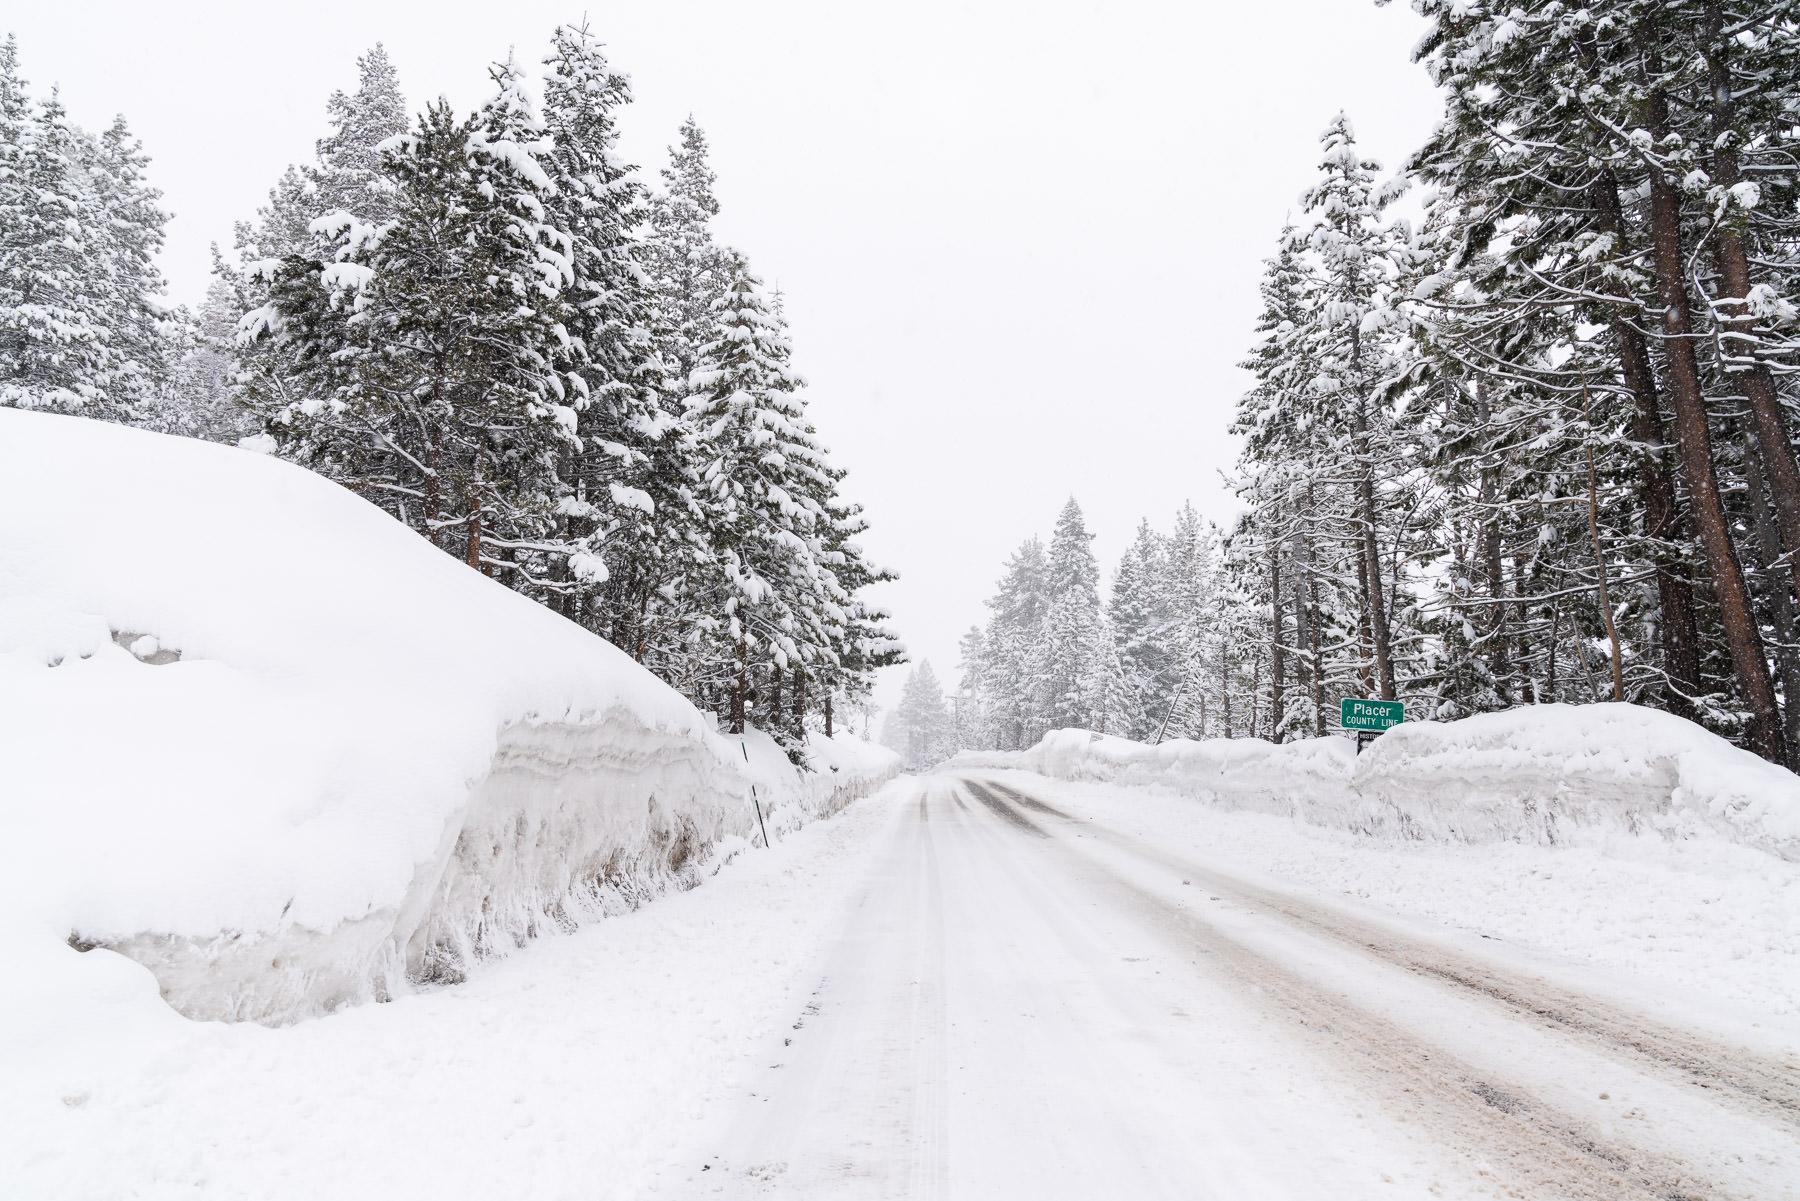 2019.03.23 Snowy Tahoe © Jennifer Carr Photography-11.jpg